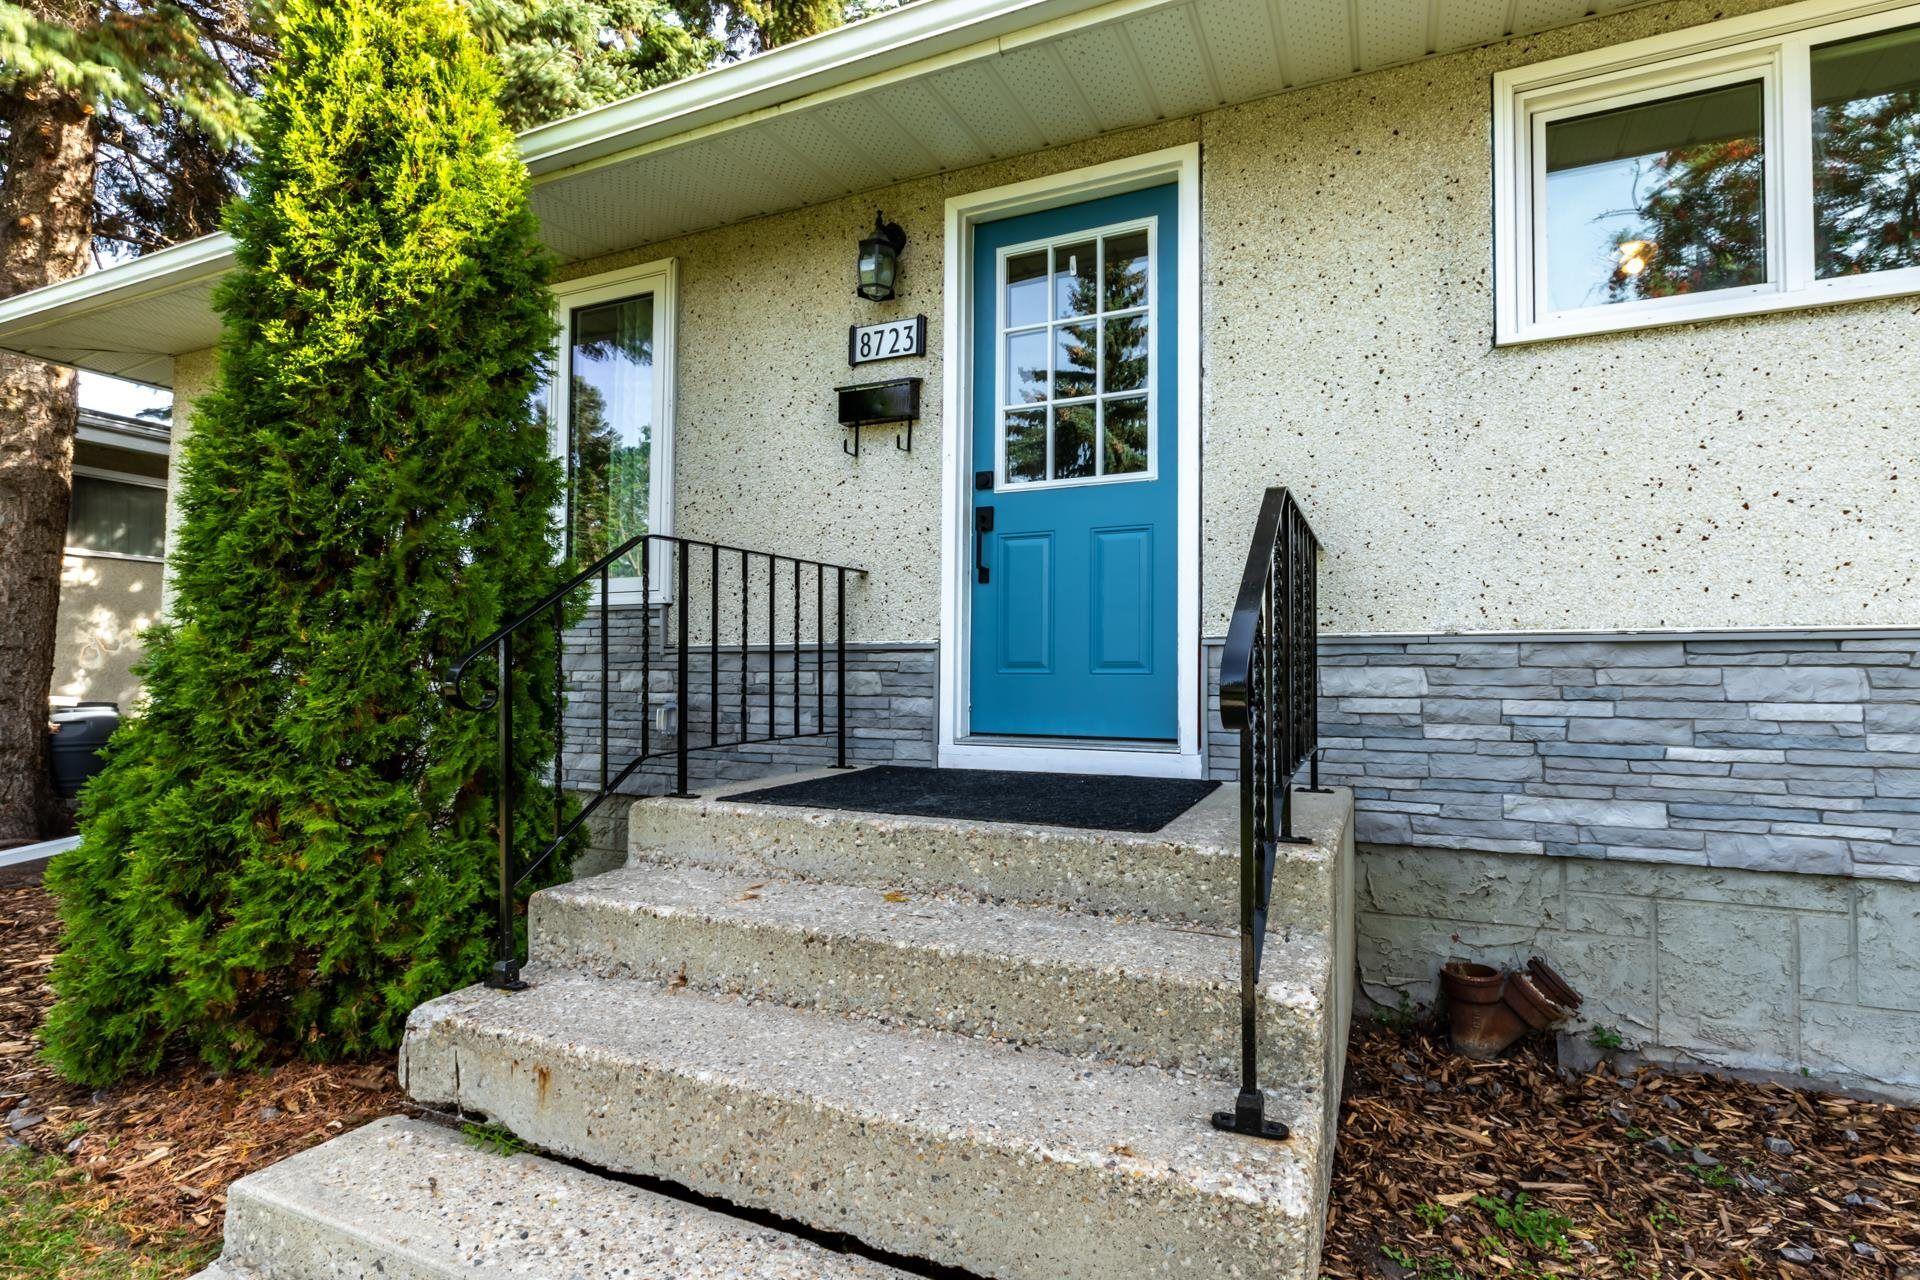 Main Photo: 8723 164 Street in Edmonton: Zone 22 House for sale : MLS®# E4263383